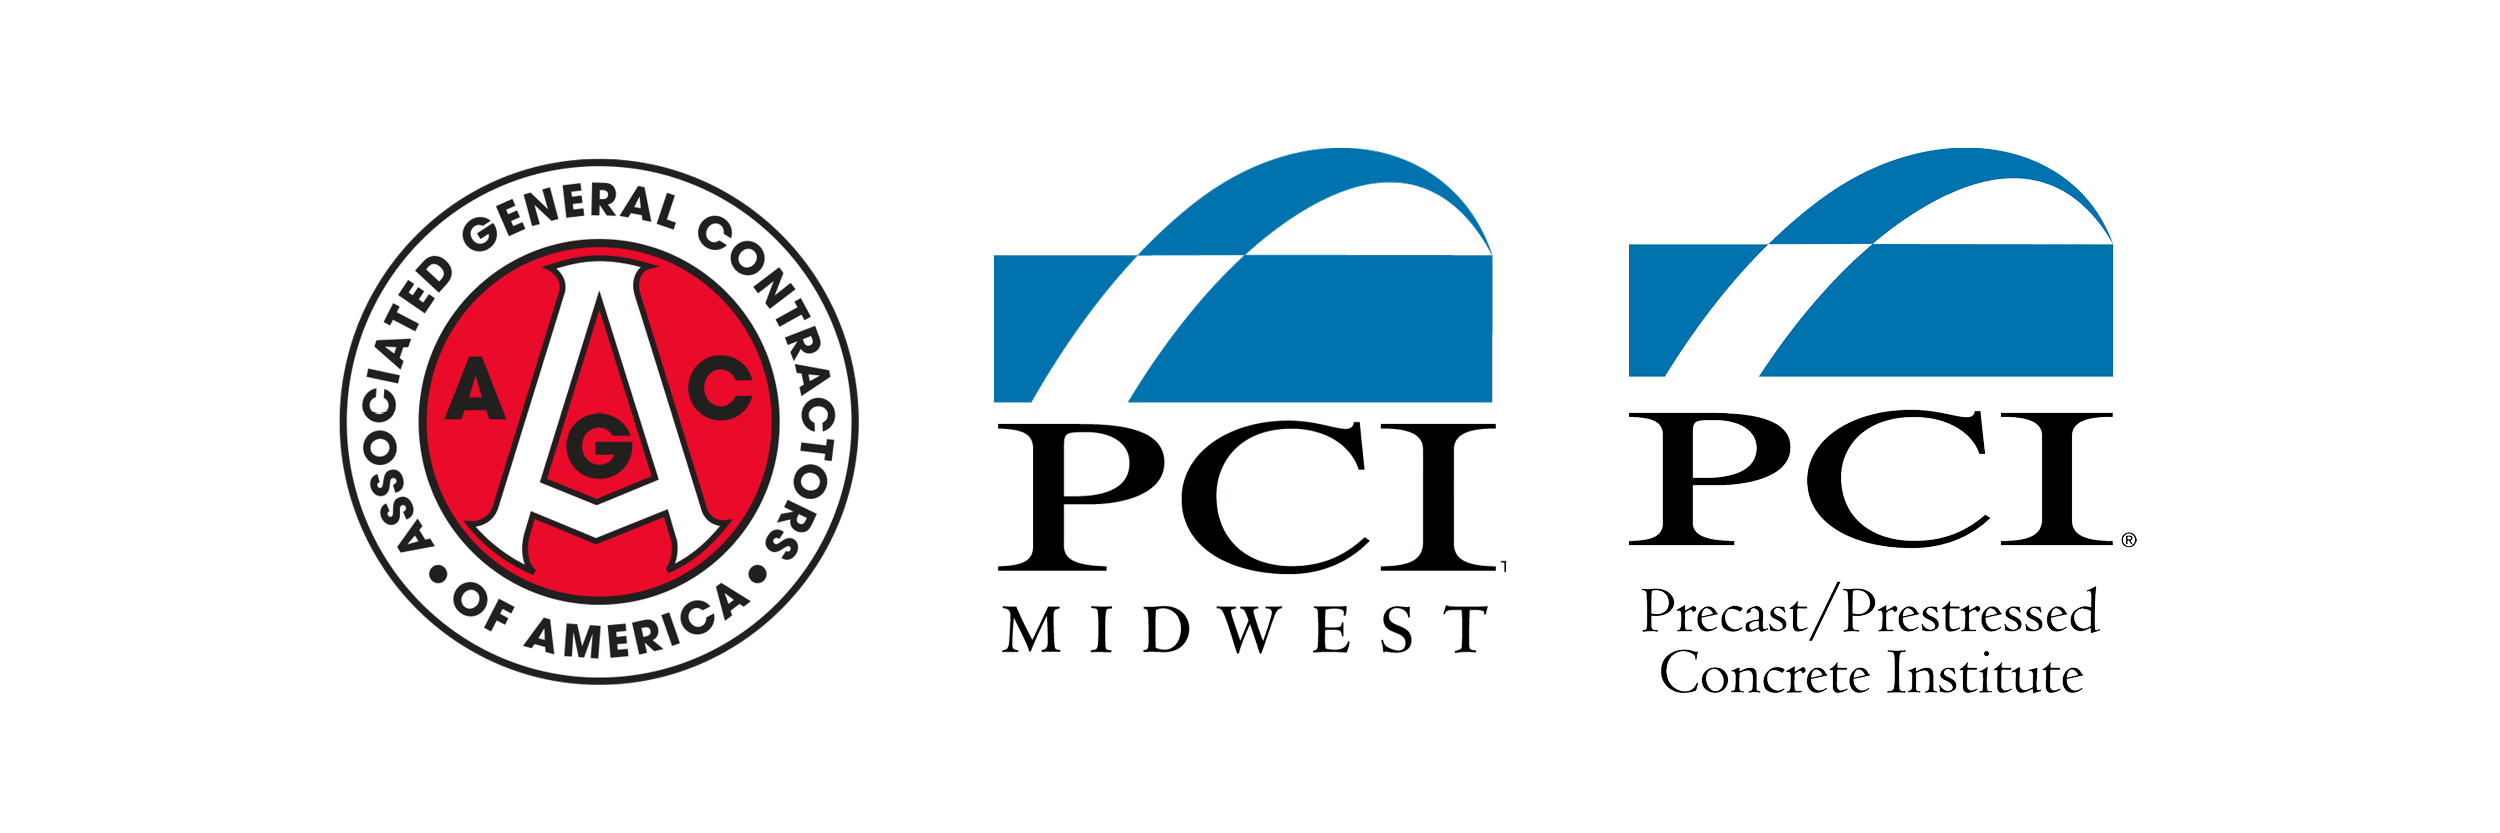 Mid America Precast is Precast/Prestressed Concrete Institute (PCI) certified